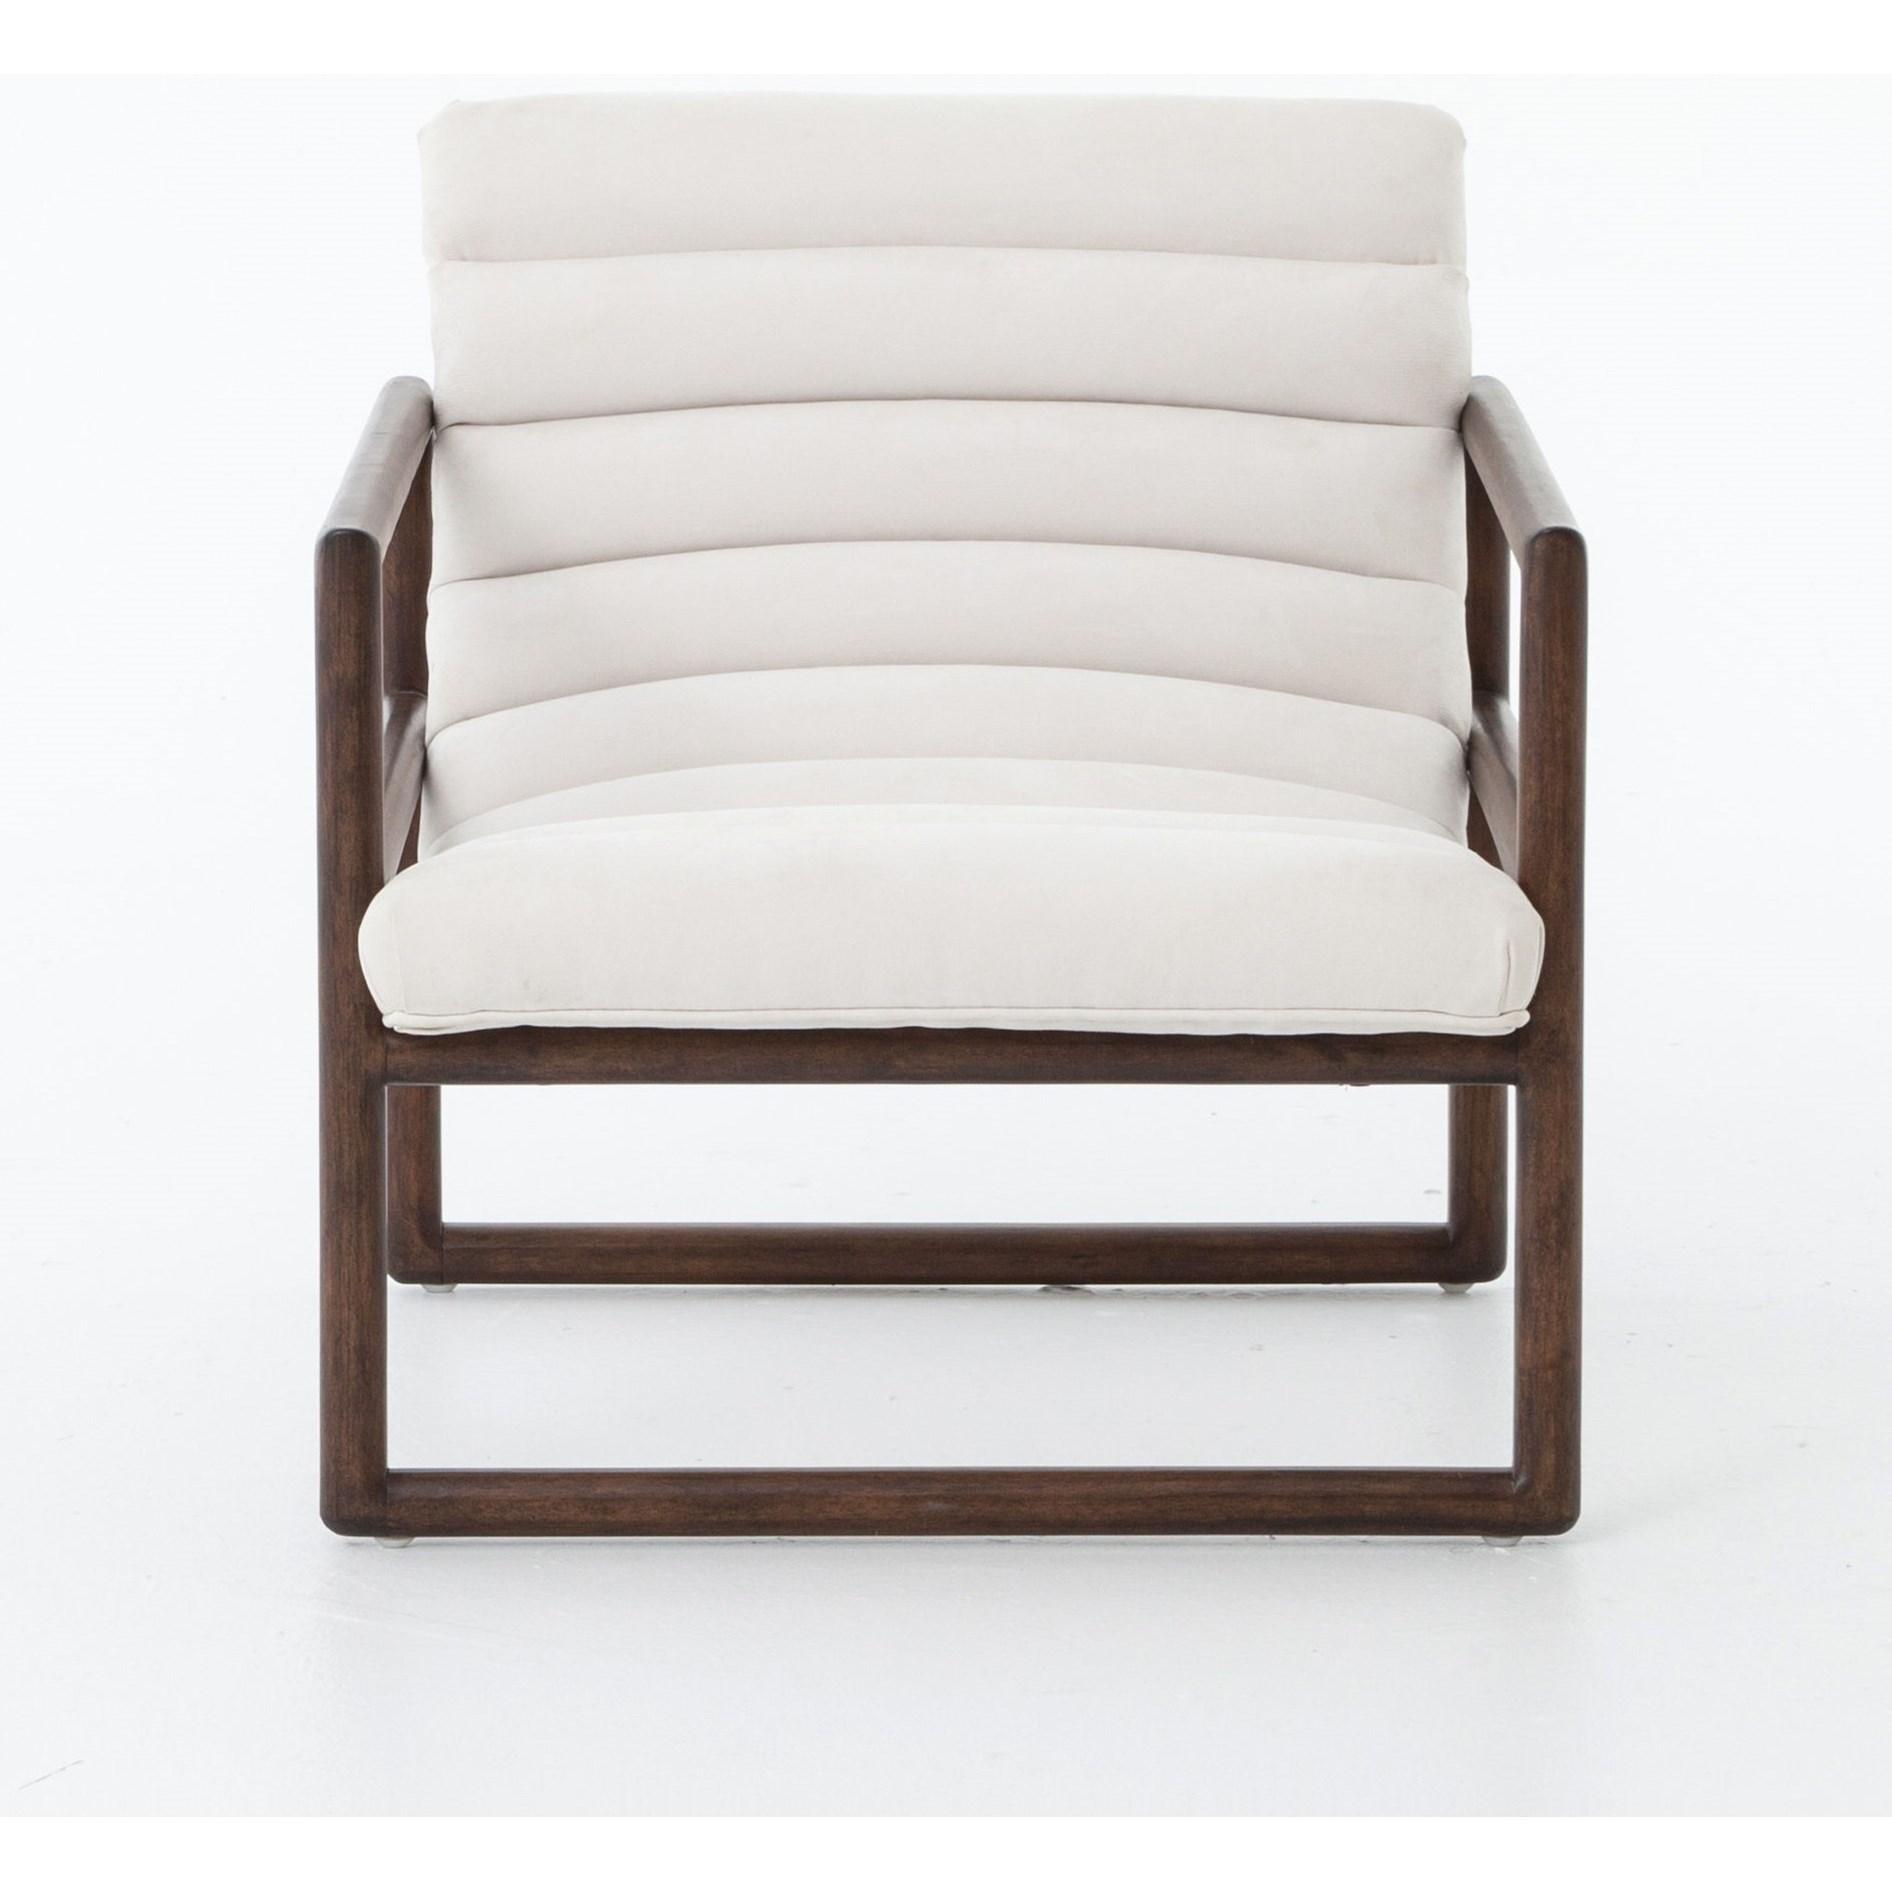 Four Hands Kensington Fitz Chair - Item Number: CKEN-F3Y-388